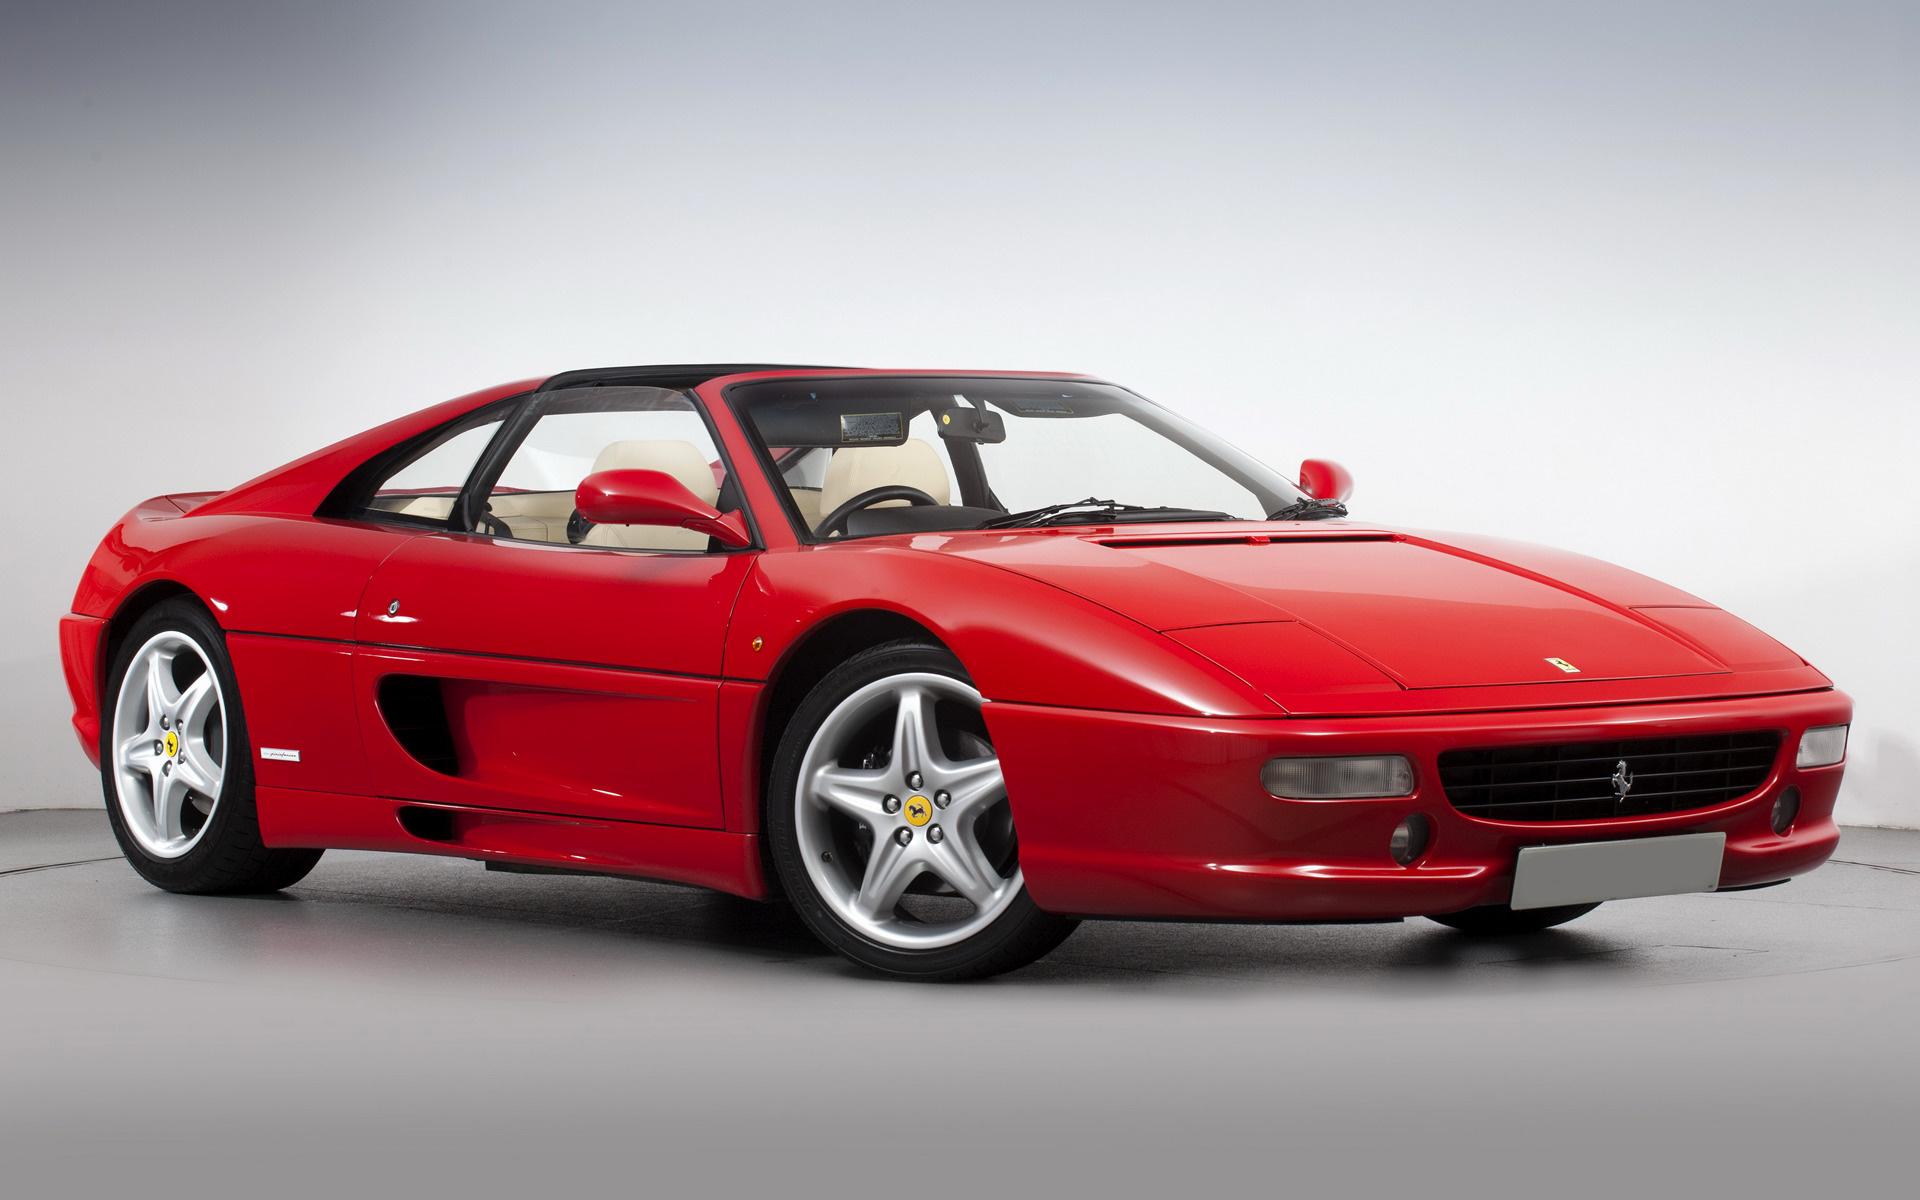 1994 Ferrari F355 GTS (UK) - Wallpapers and HD Images ...